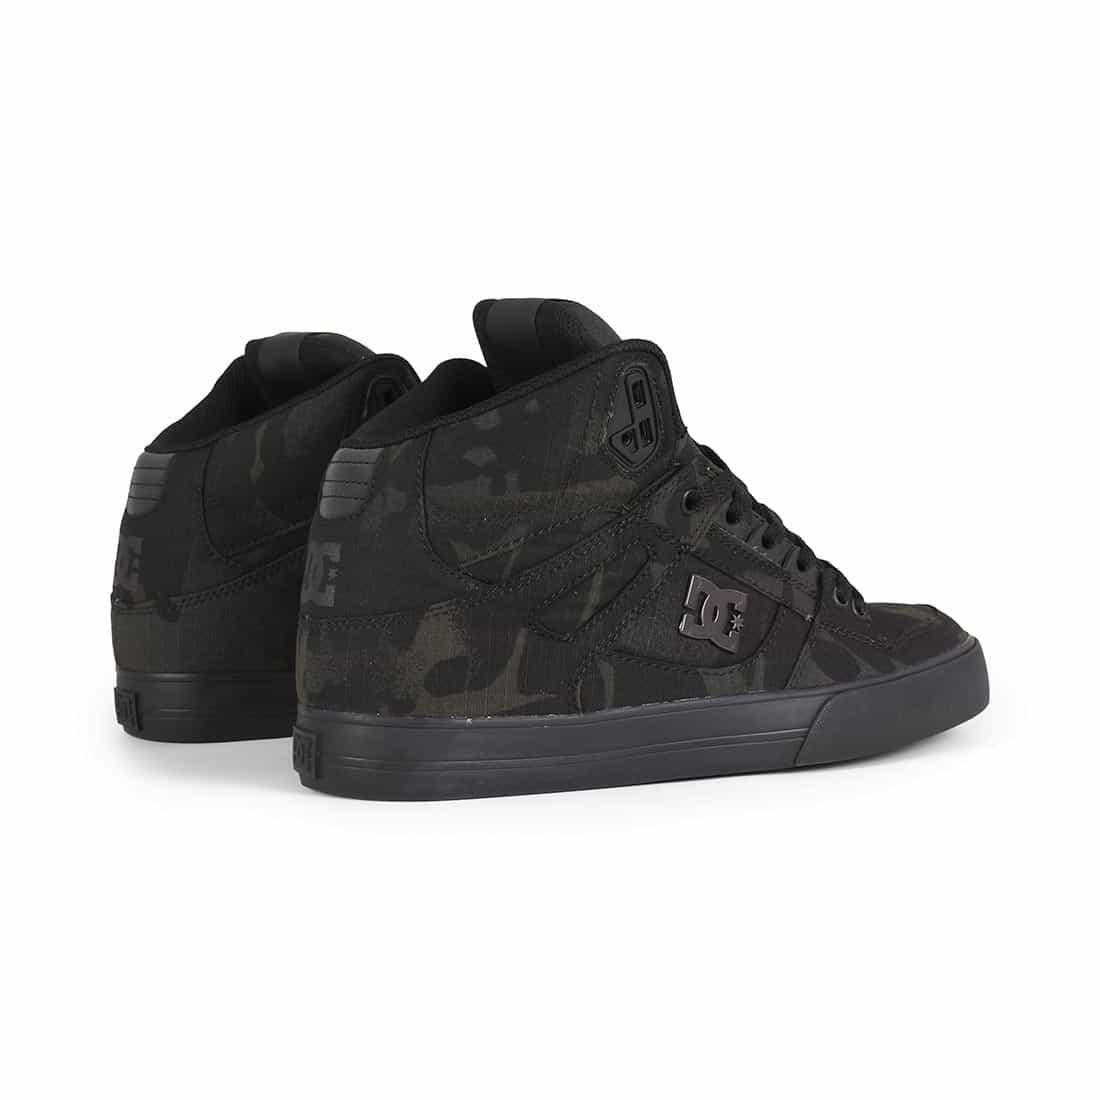 DC Shoes Pure High Top WC TX SE - Camo